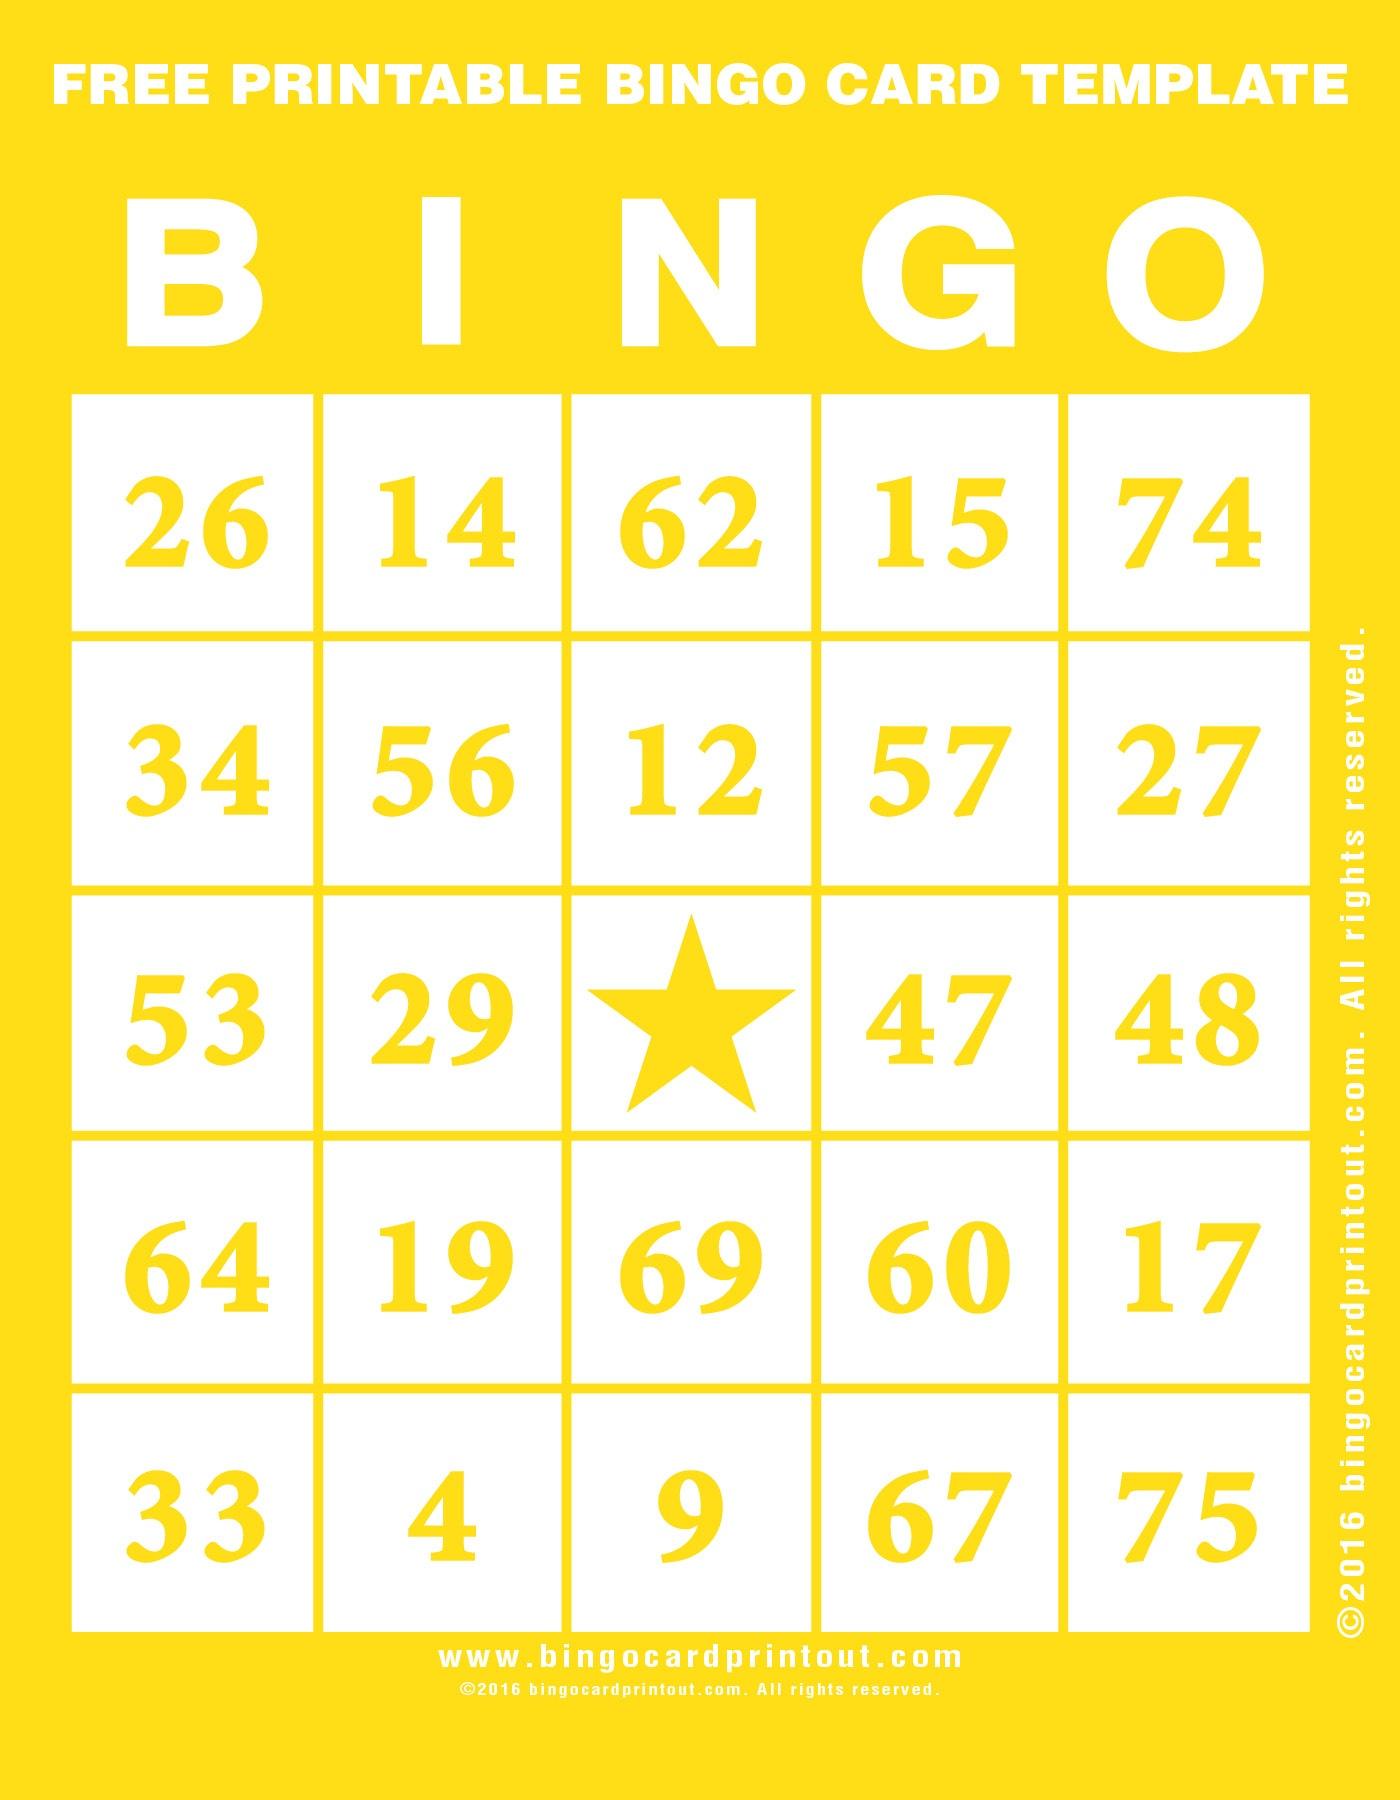 Free Printable Bingo Card Template - Bingocardprintout - Free Printable Bingo Cards